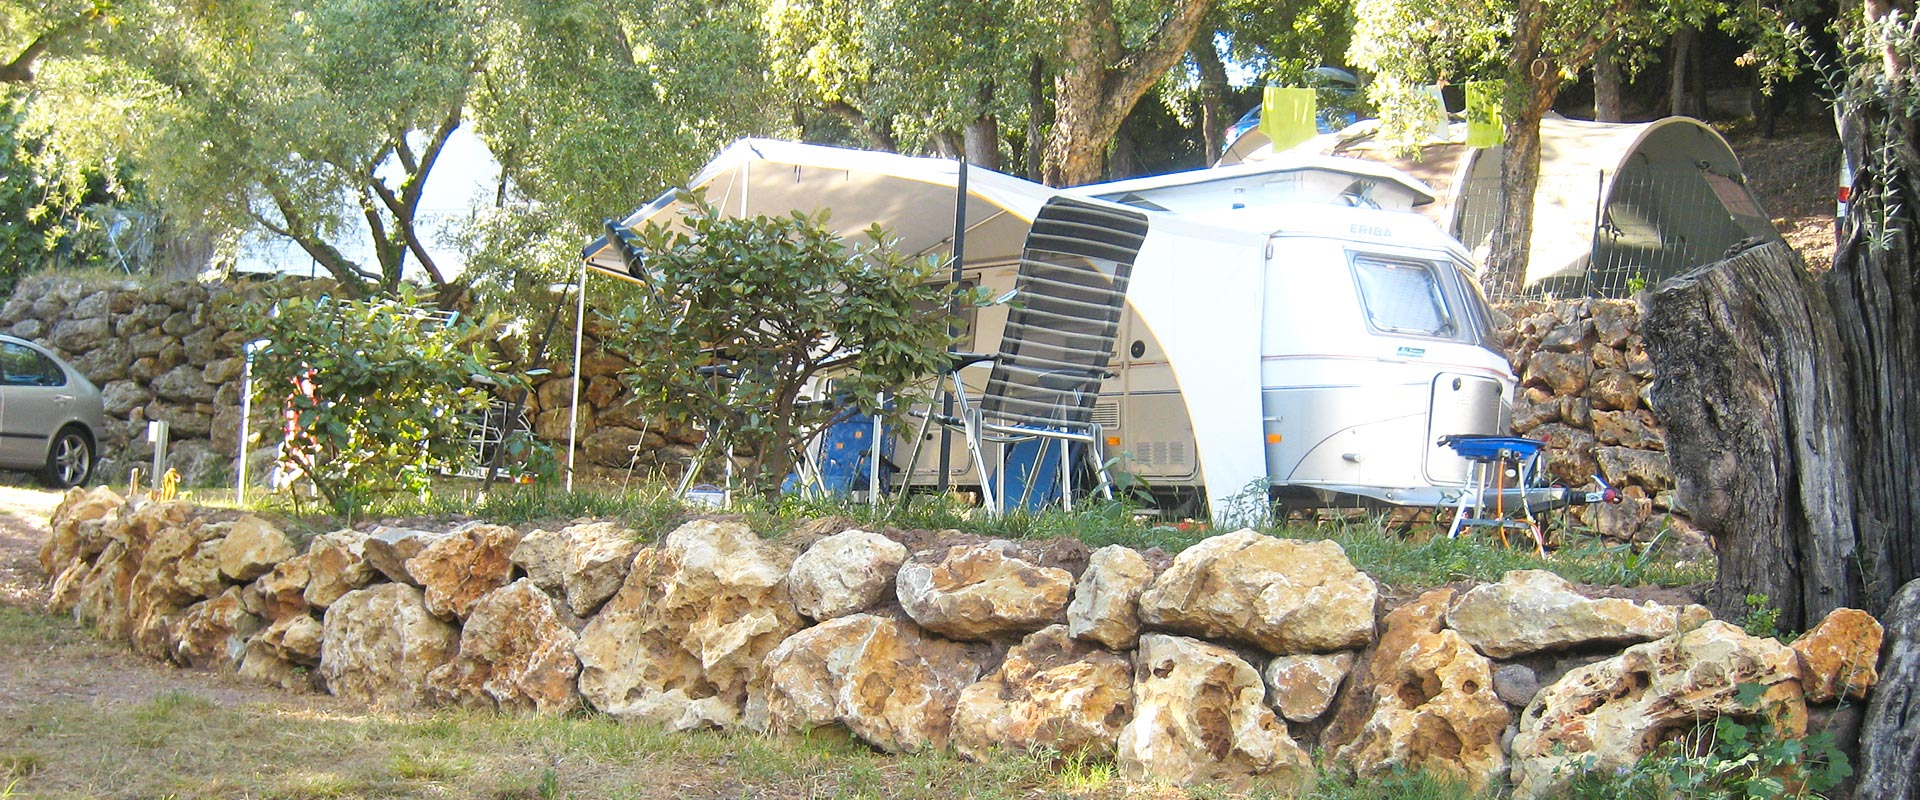 Caravanplaats - Camping les Philippons